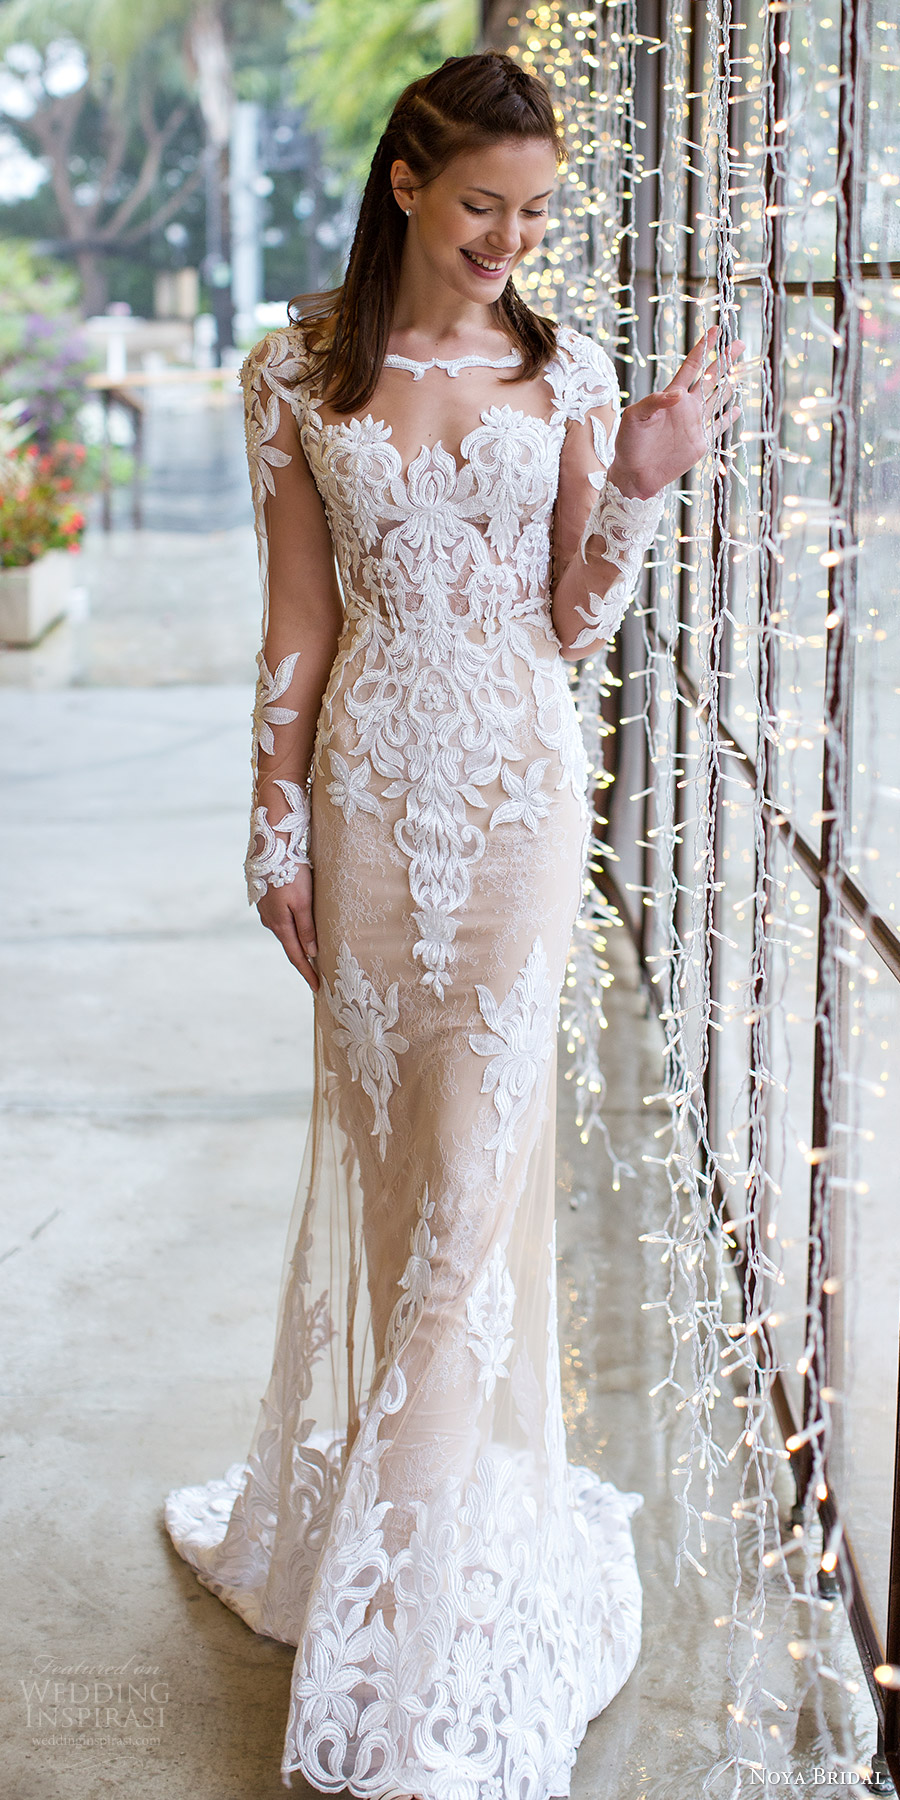 Noya Bridal 2016 Illusion Long Sleeve Scalloped Sweetheart Jewel Sheath Wedding Dress 1201